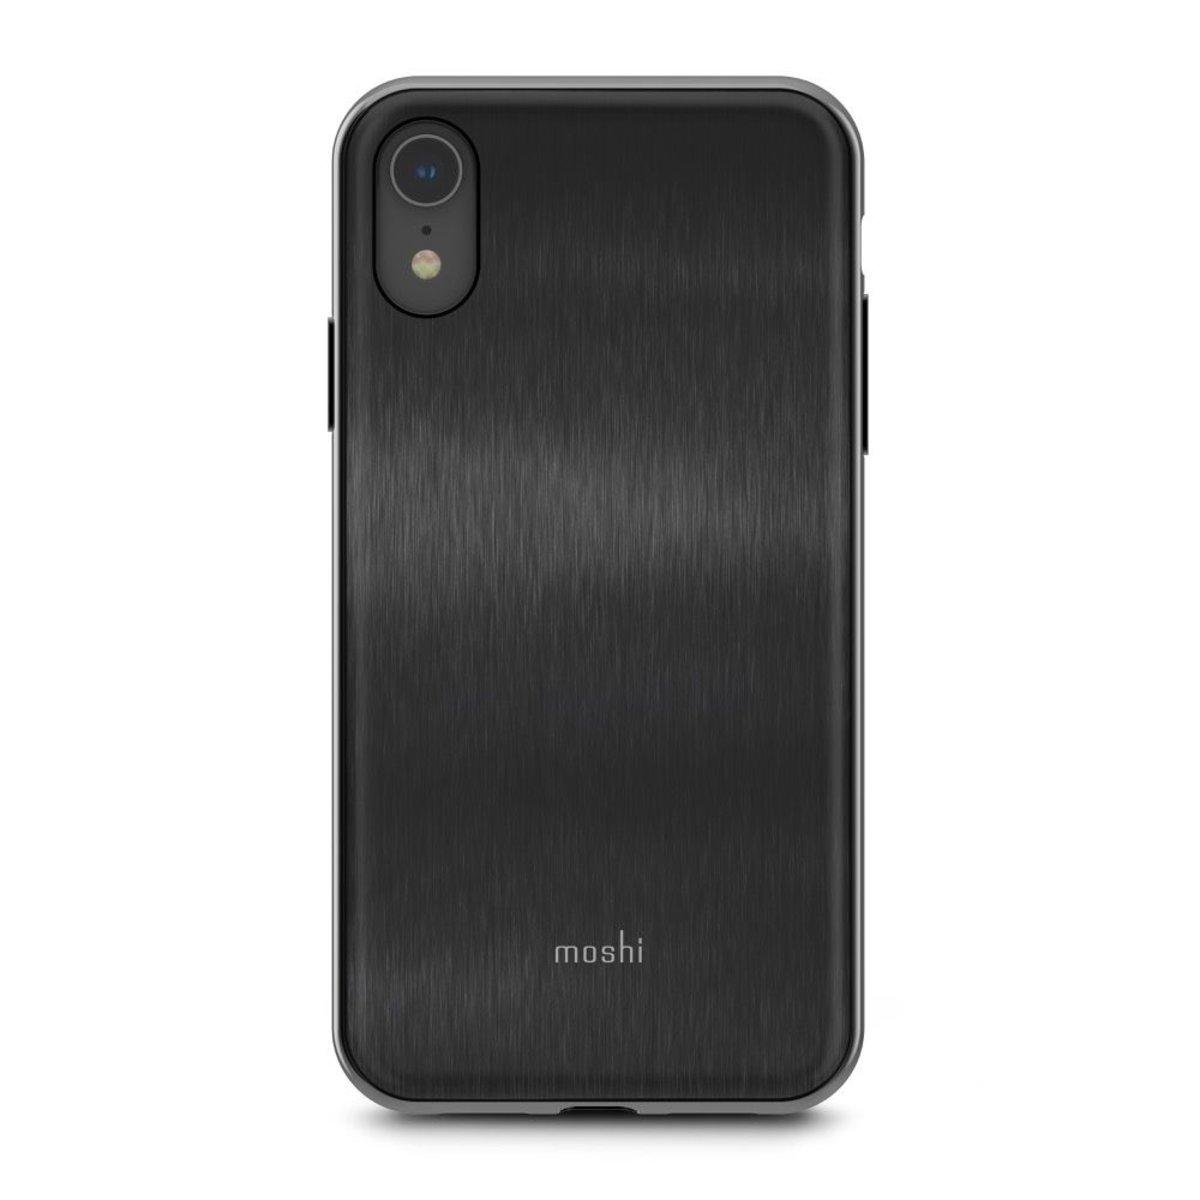 iGlaze iPhone XR 超薄時尚保護殼 - 黑